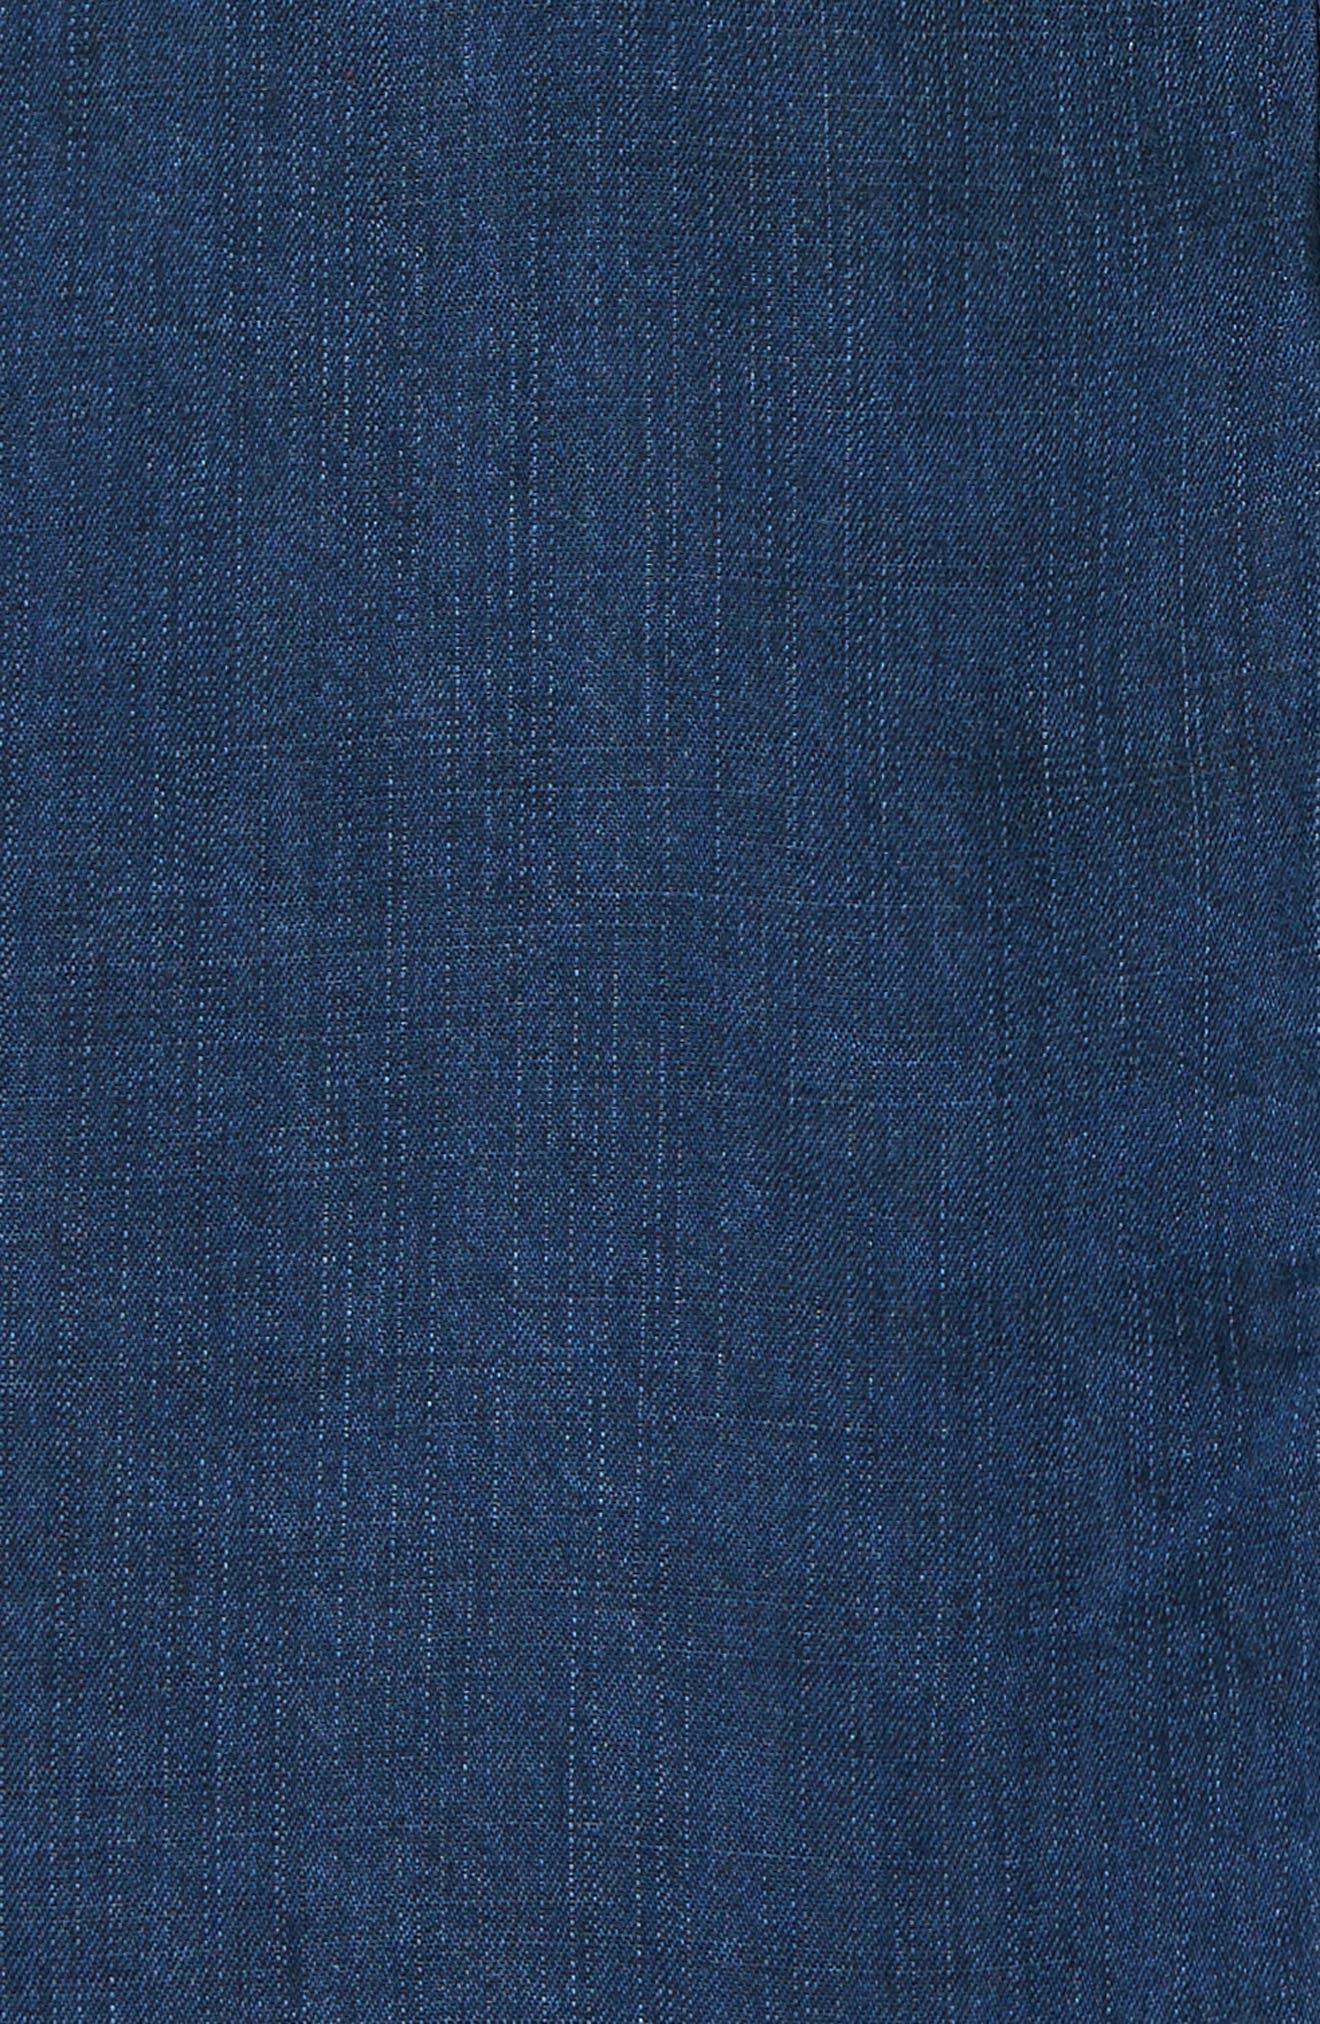 Ashland Chambray Shirtdress,                             Alternate thumbnail 5, color,                             404